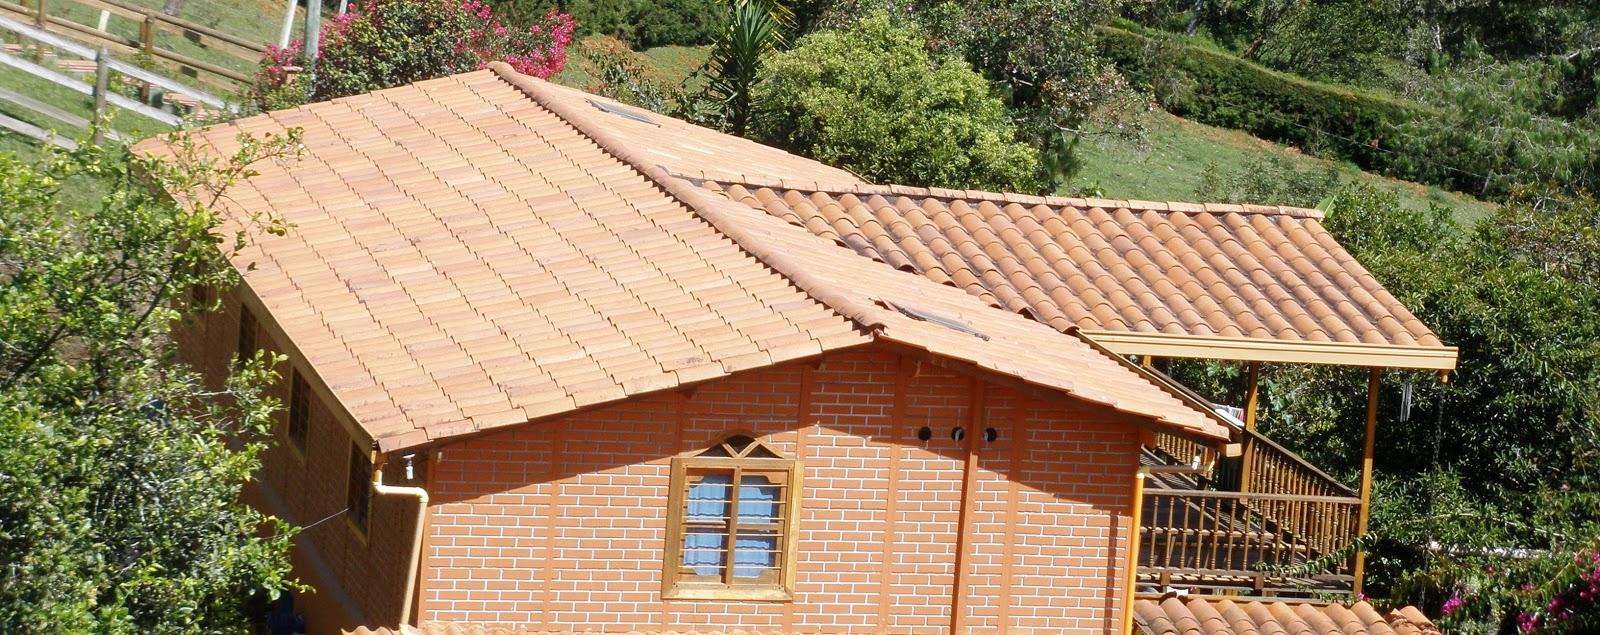 Casas Prefabricadas Casa Real Ficha Tecnica